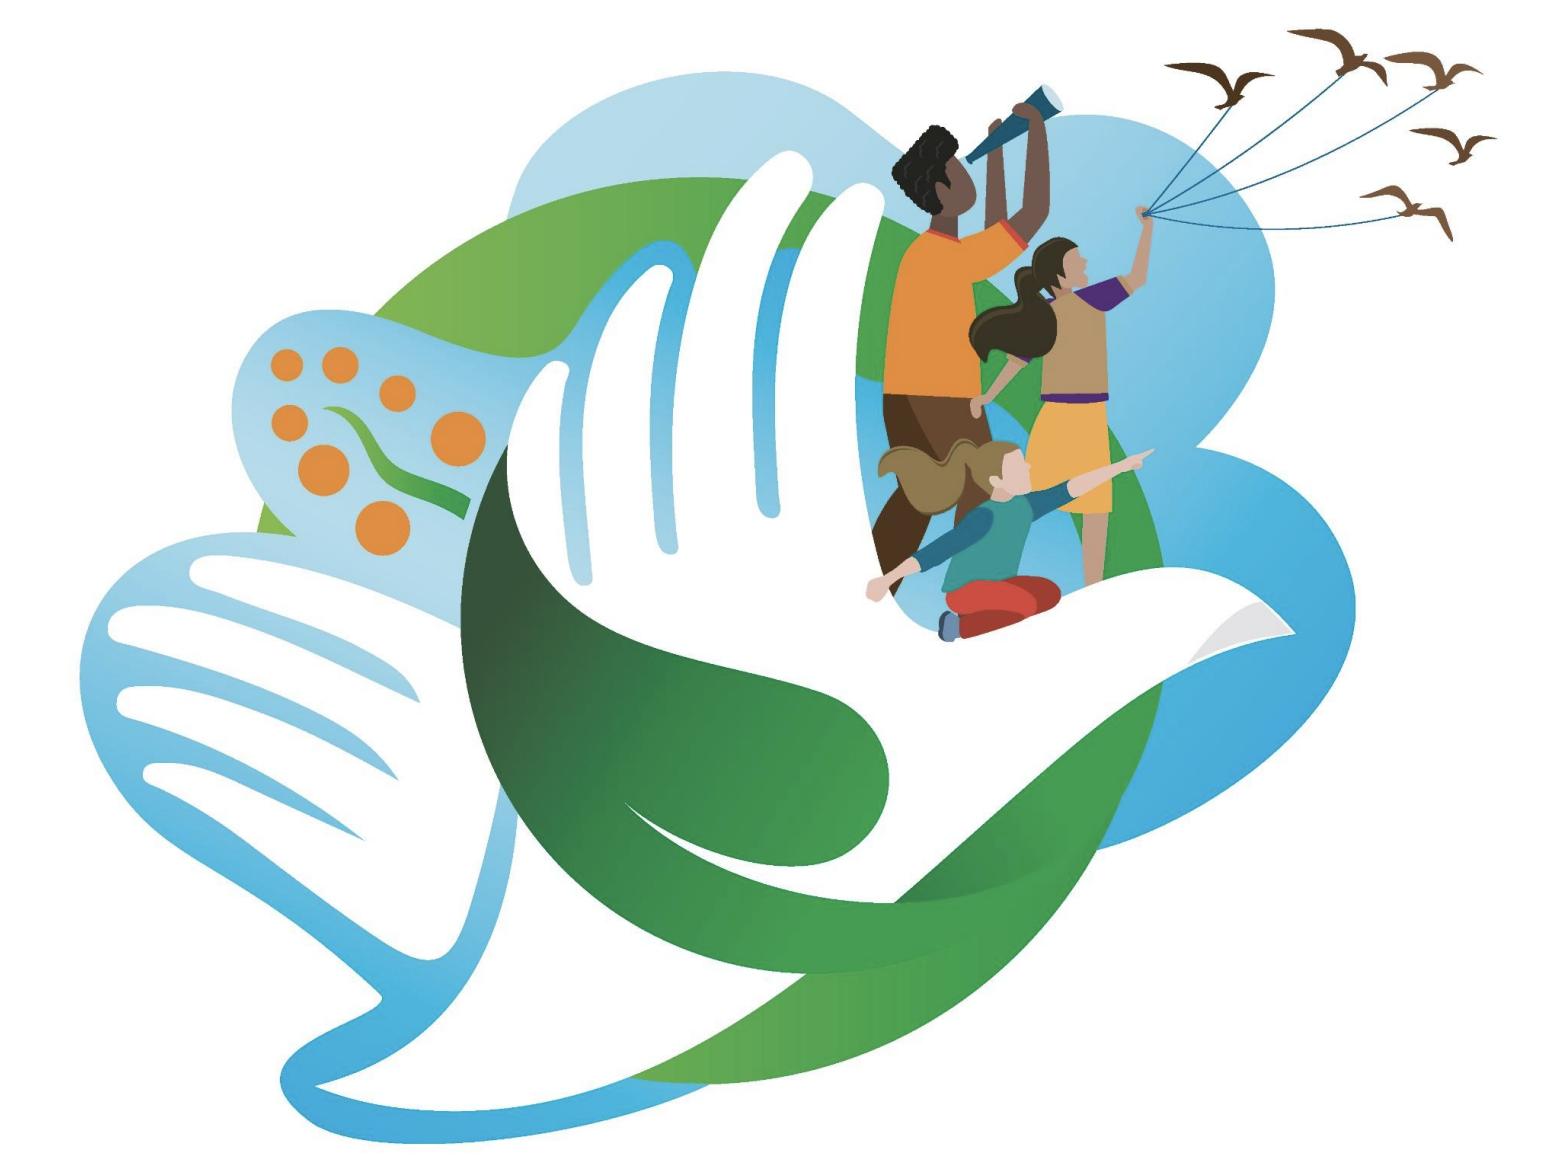 Rezolúcia OSN ku Dňu za odstránenie chudoby